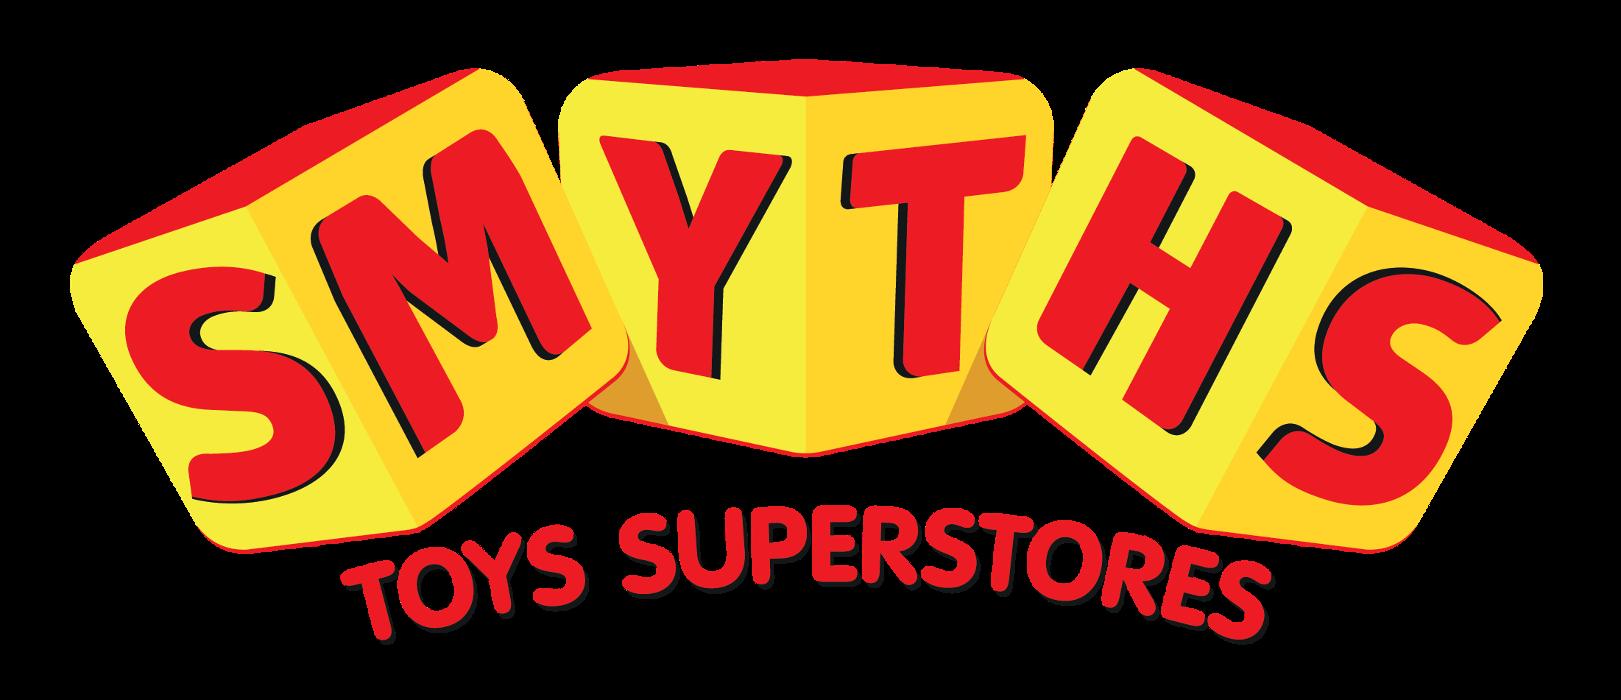 Smyths Toys Superstores in Berlin